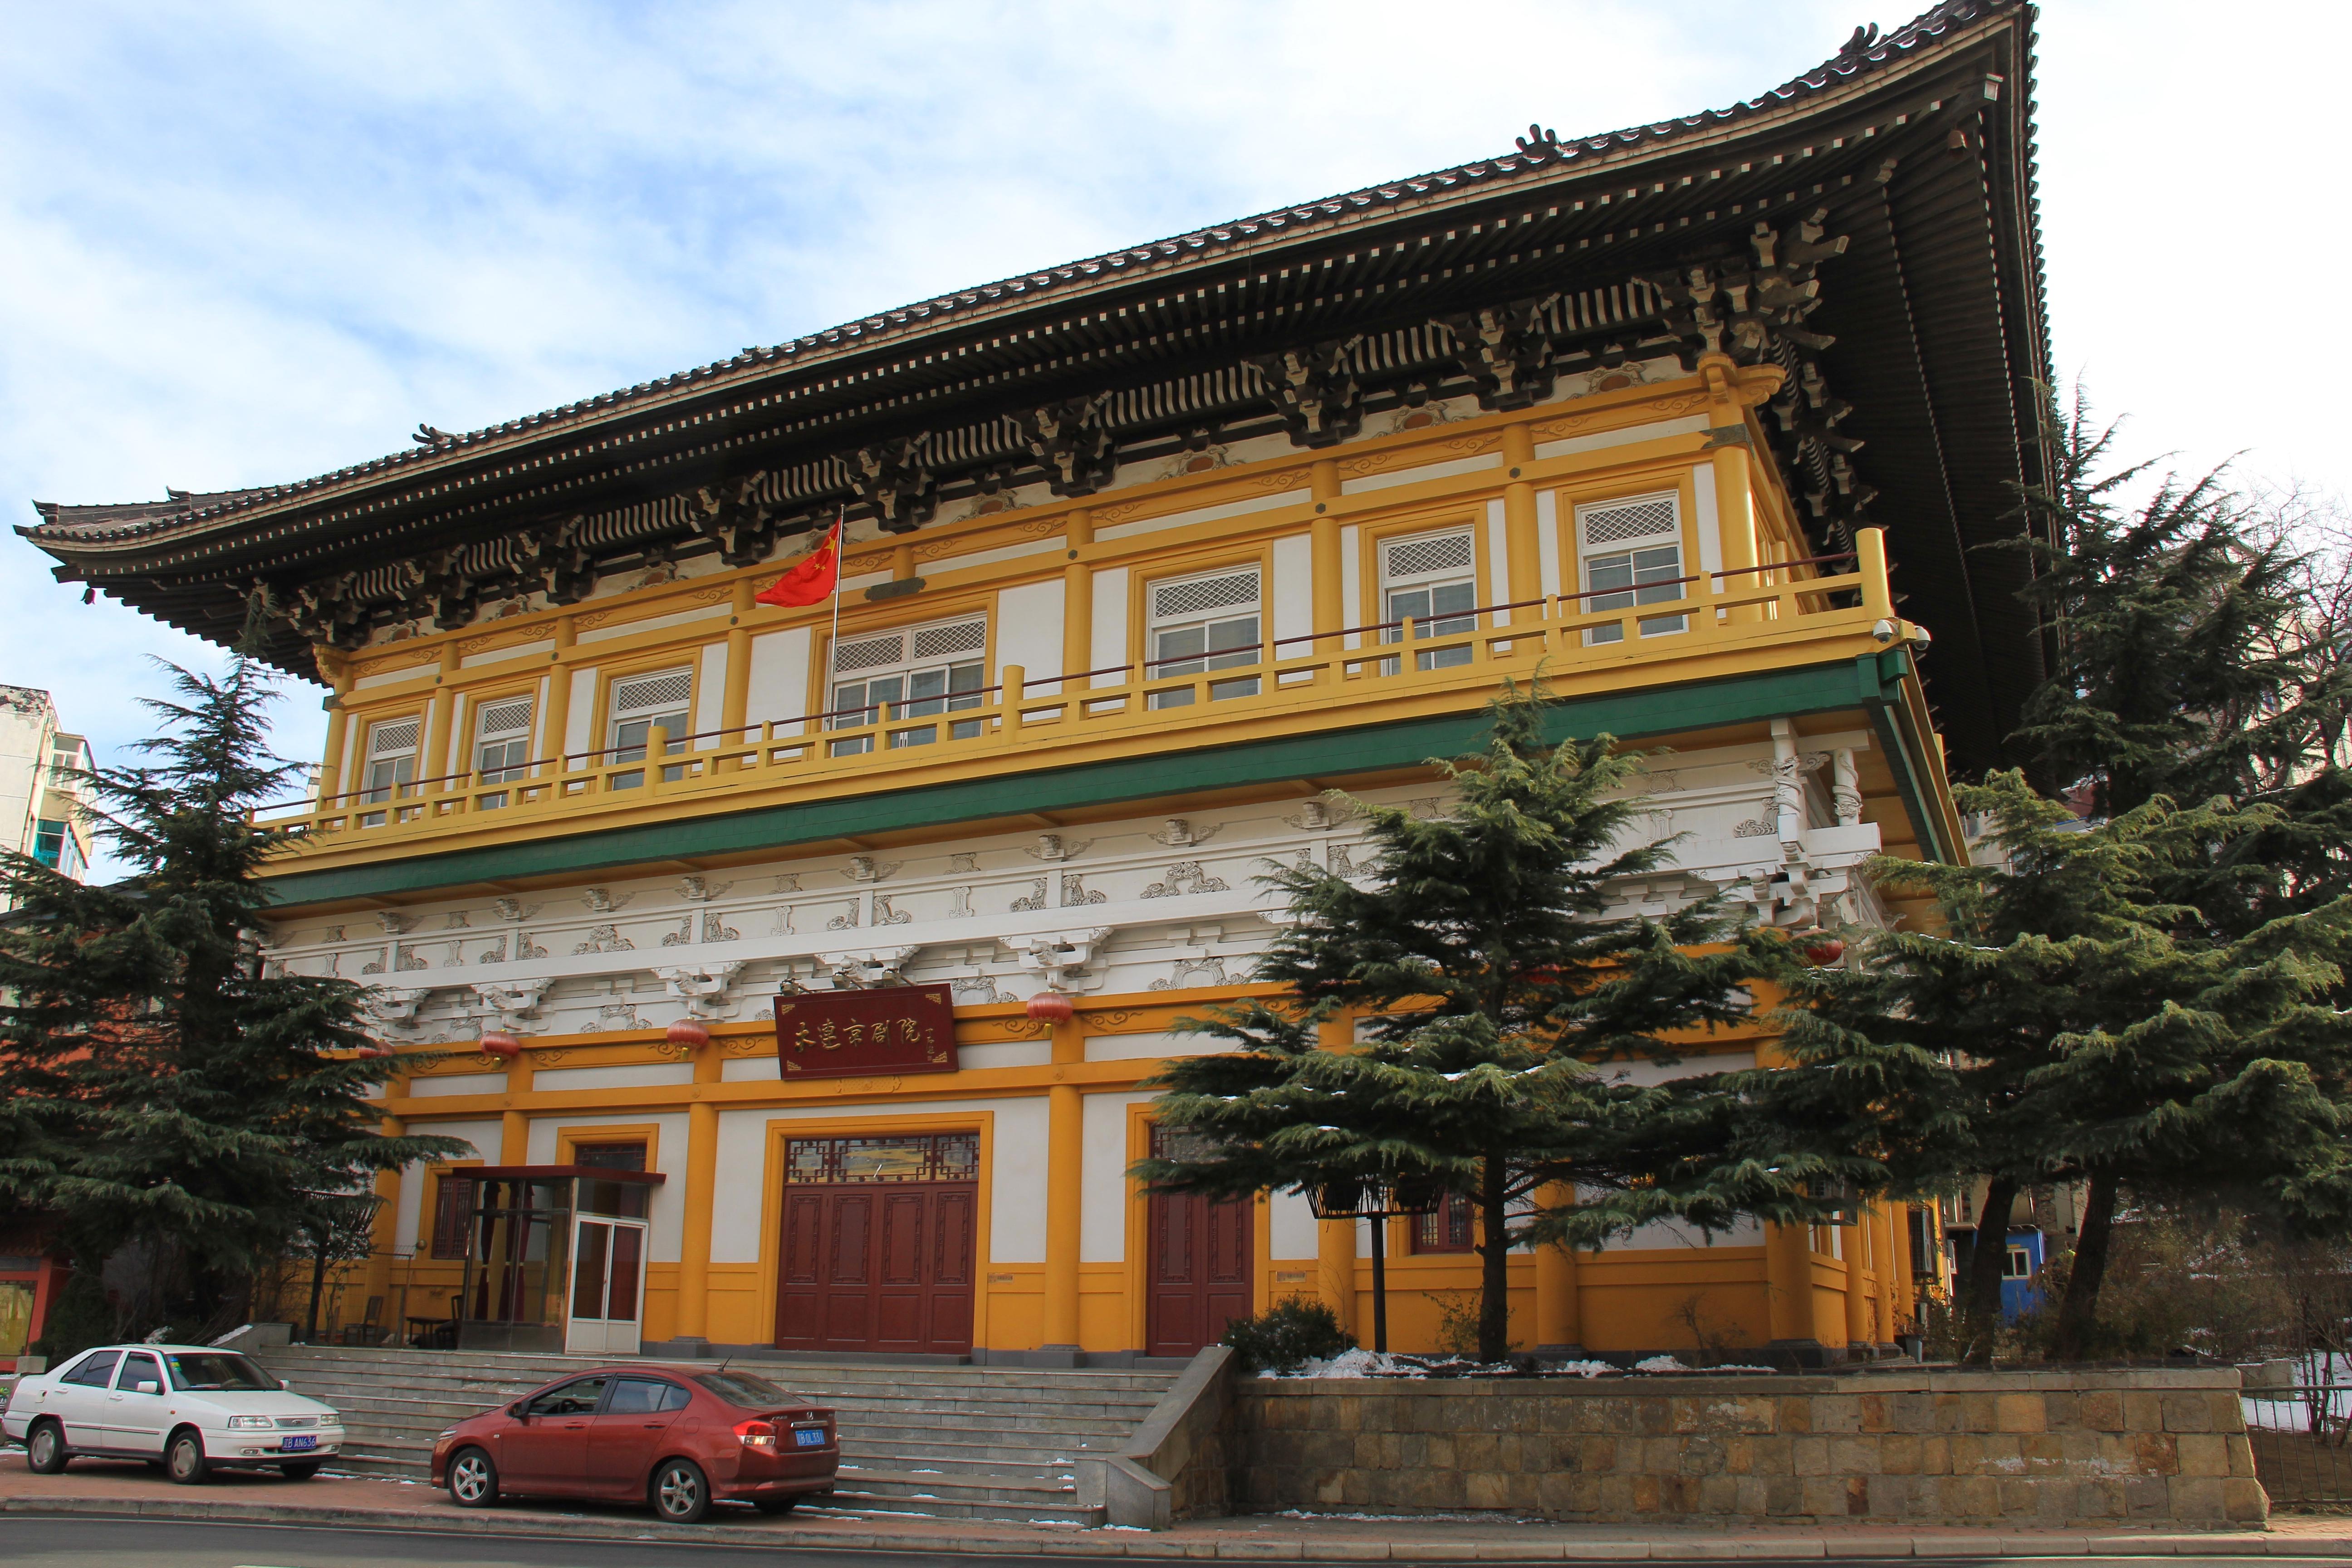 Photo sheep housing plans images photo shearing shed for Beijing opera house architect